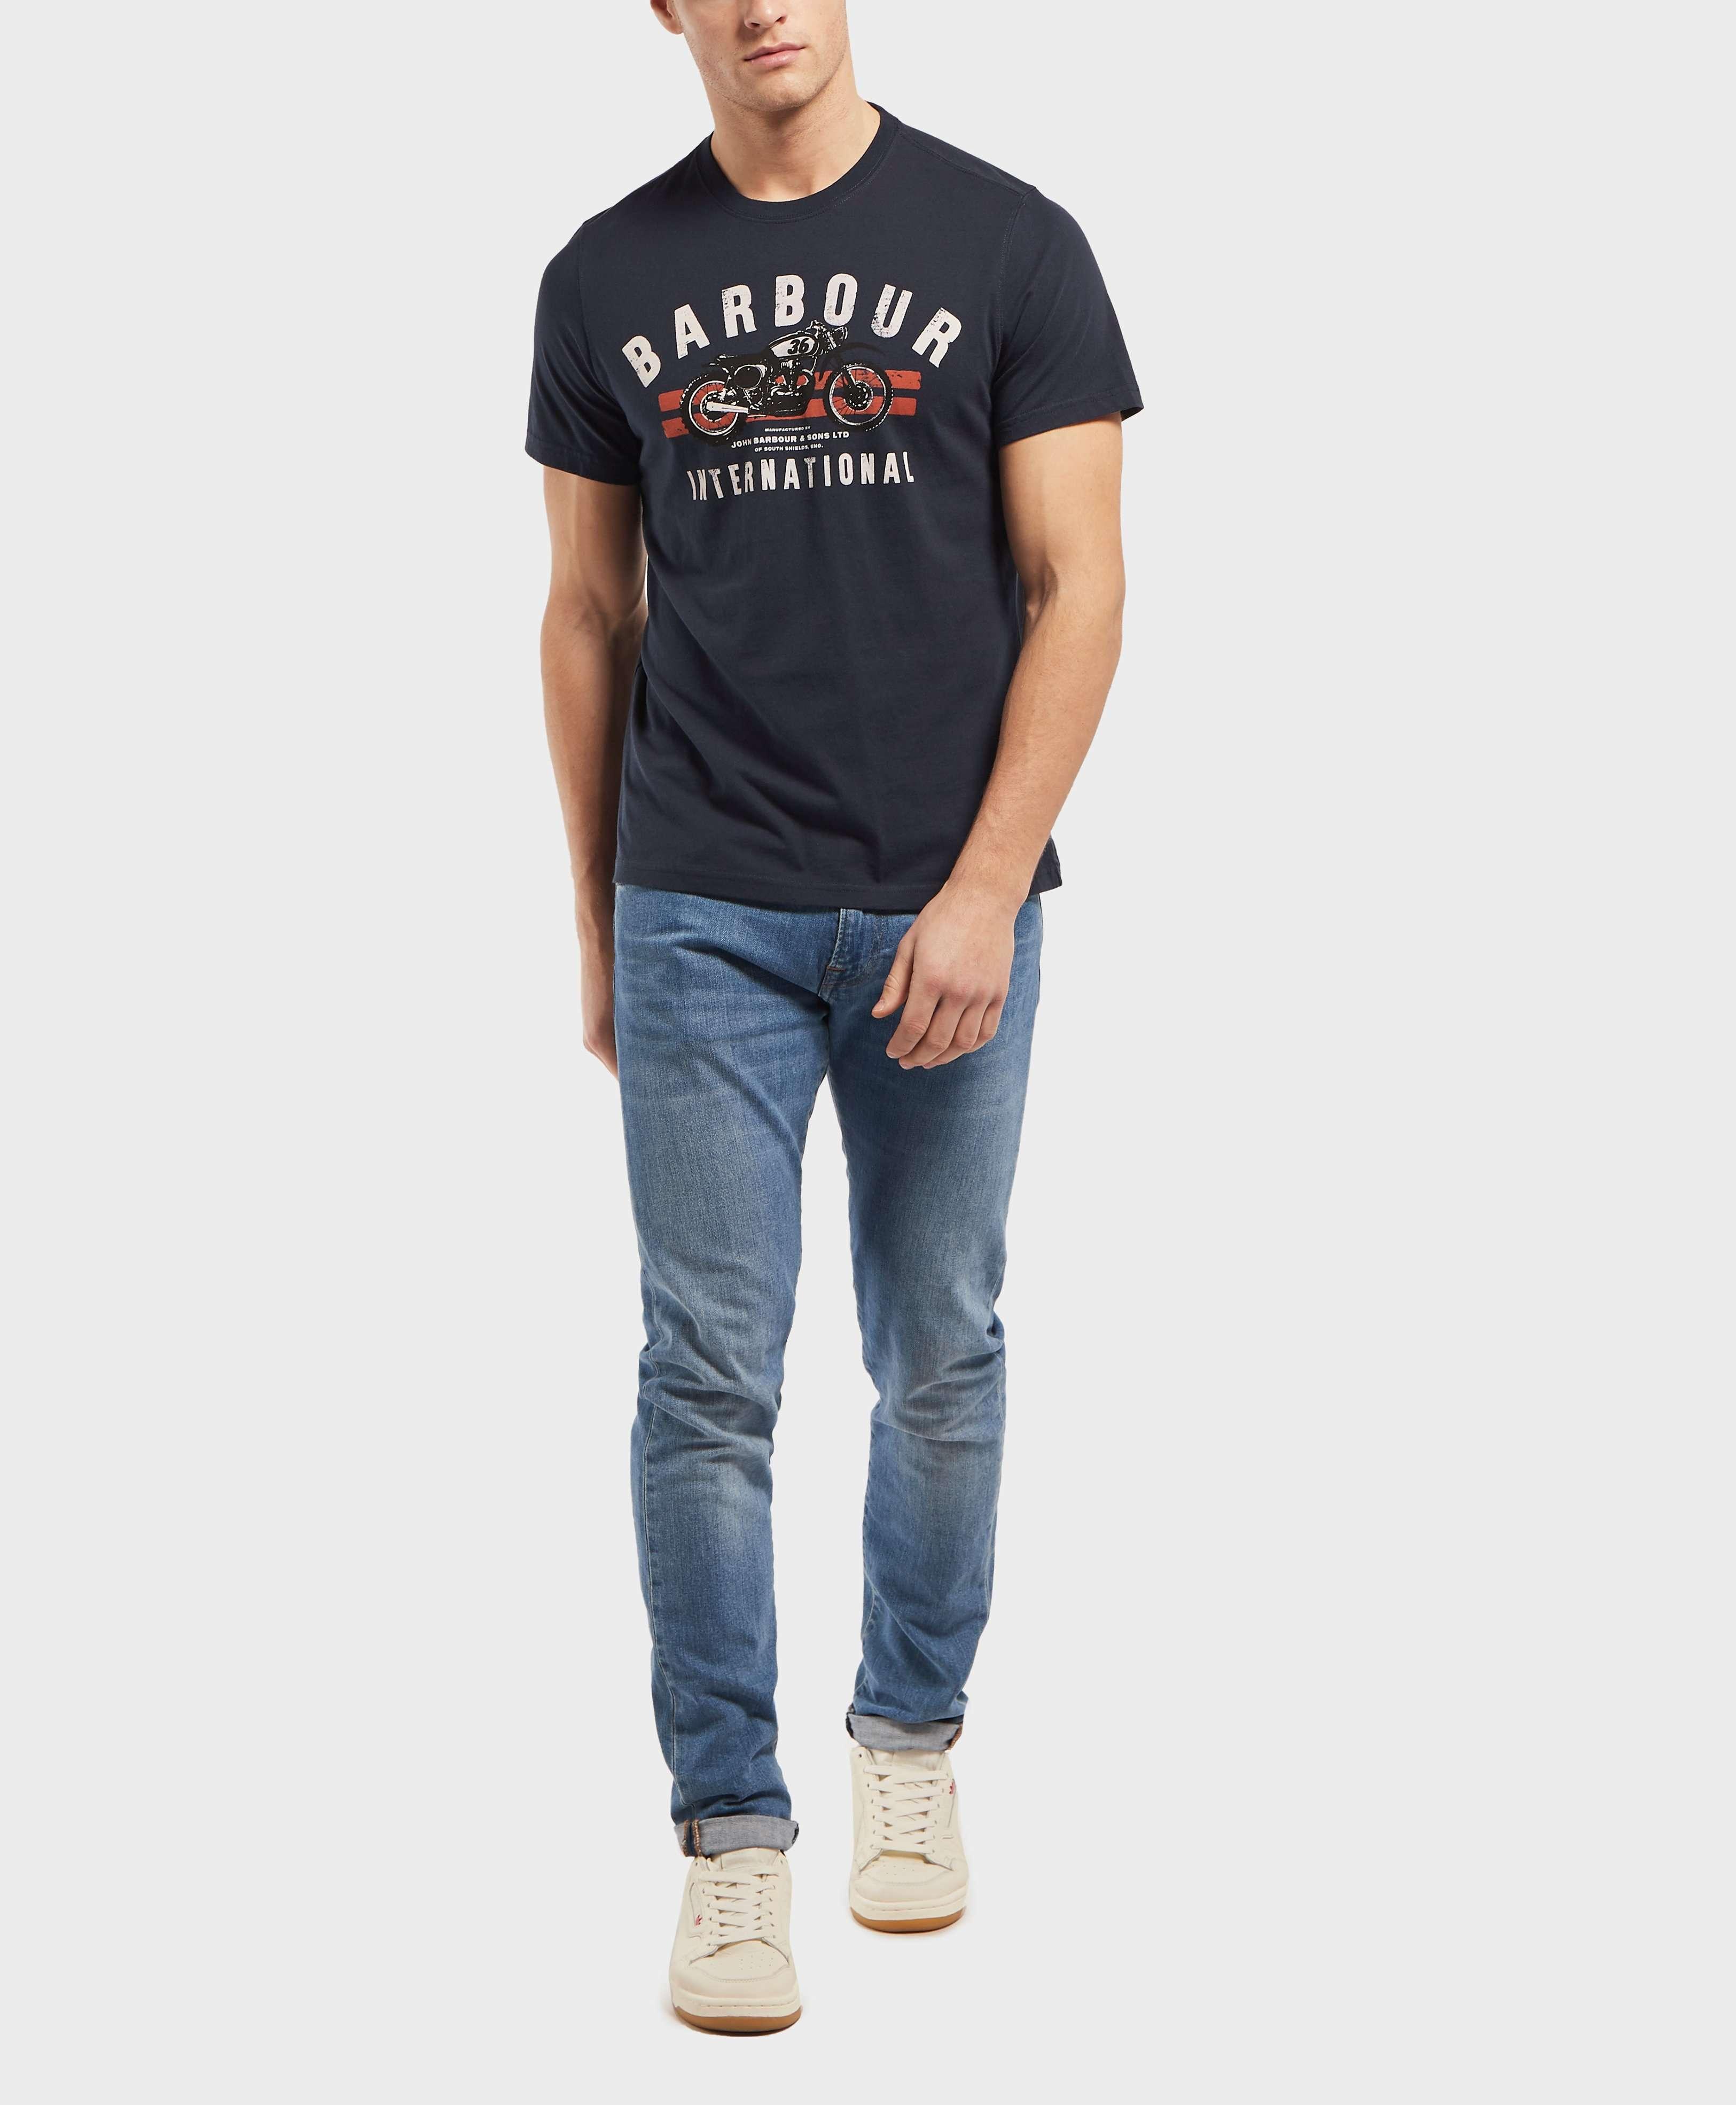 Barbour International Bike Short Sleeve T-Shirt